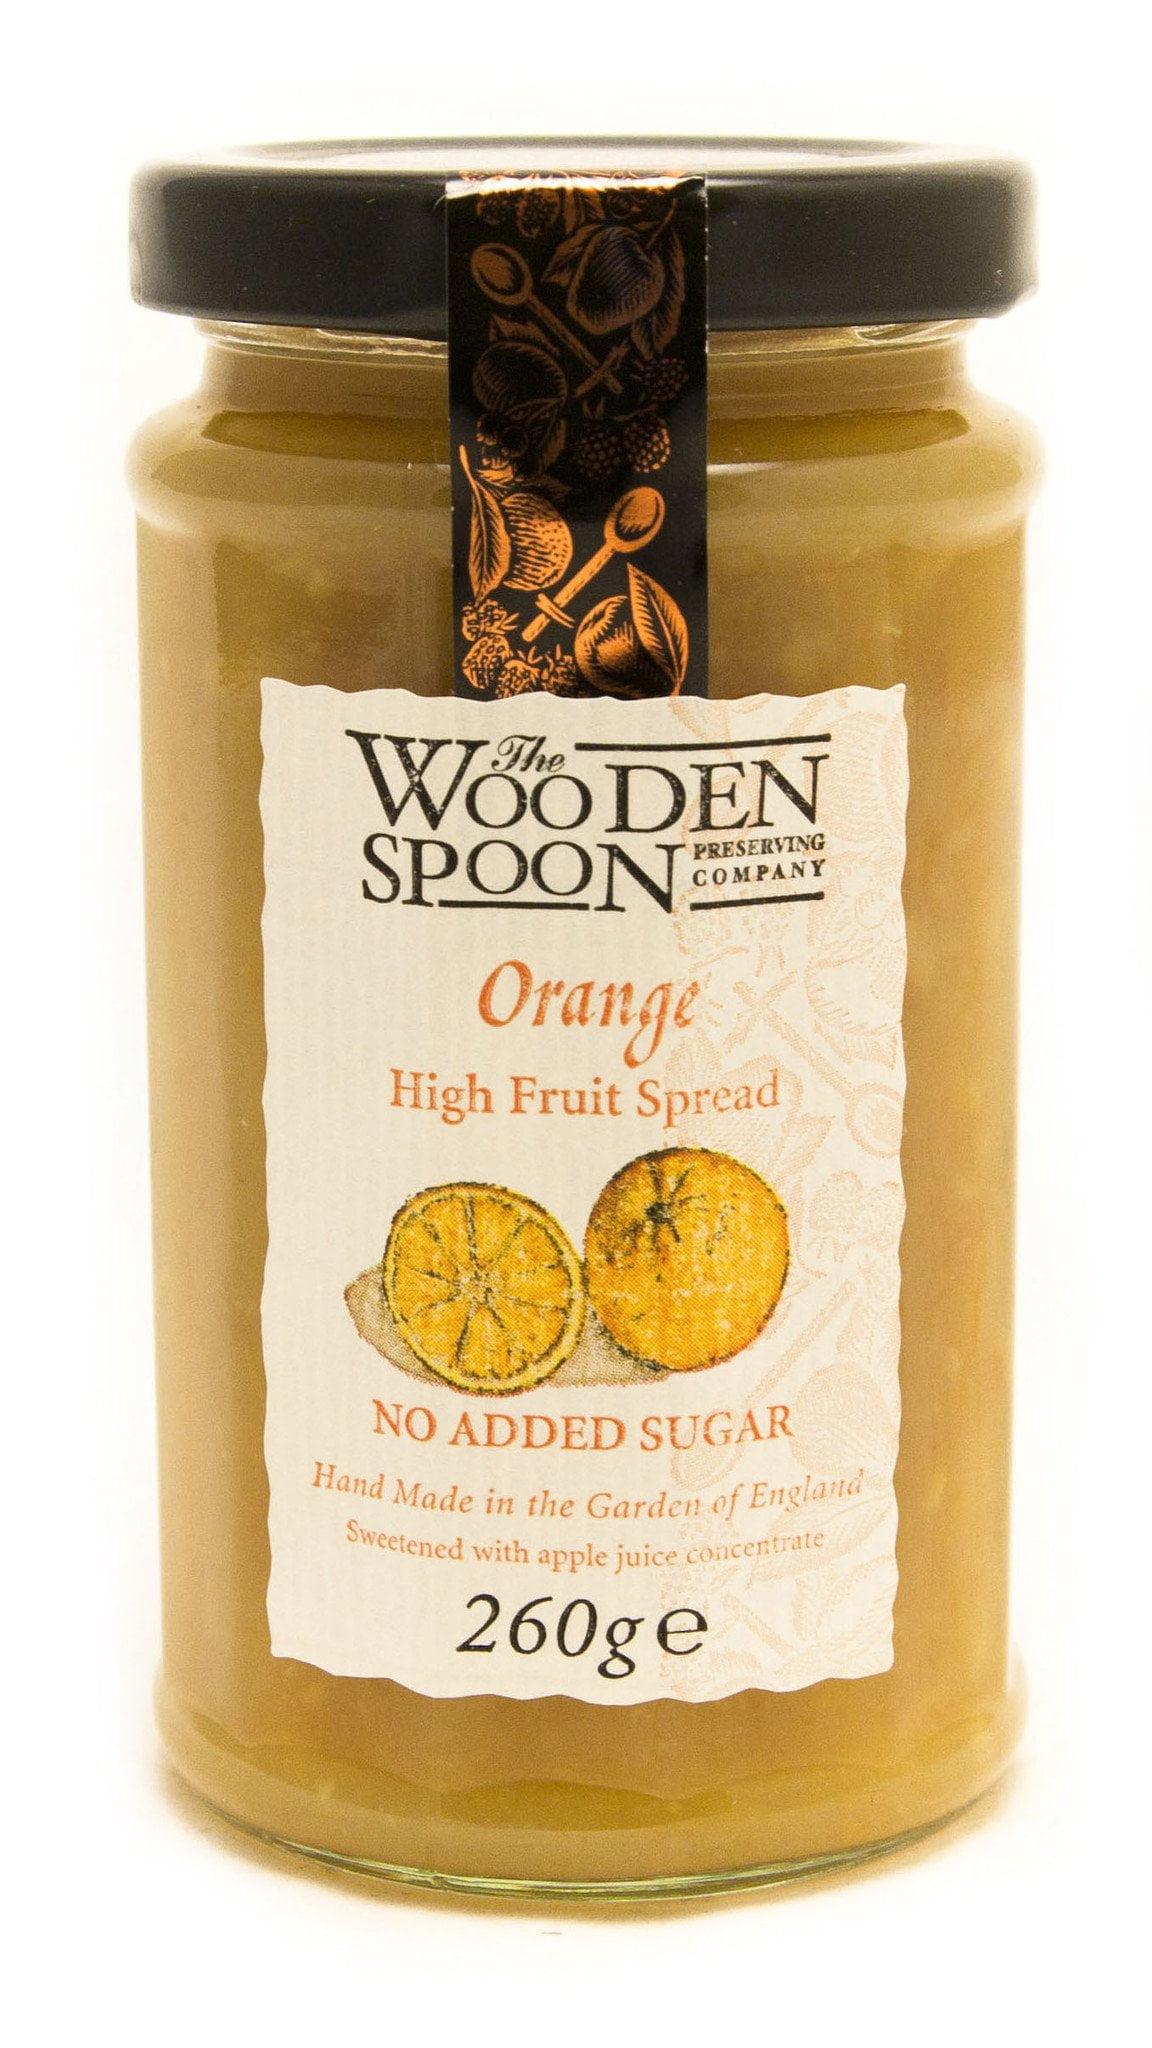 Orange - High Fruit Spread